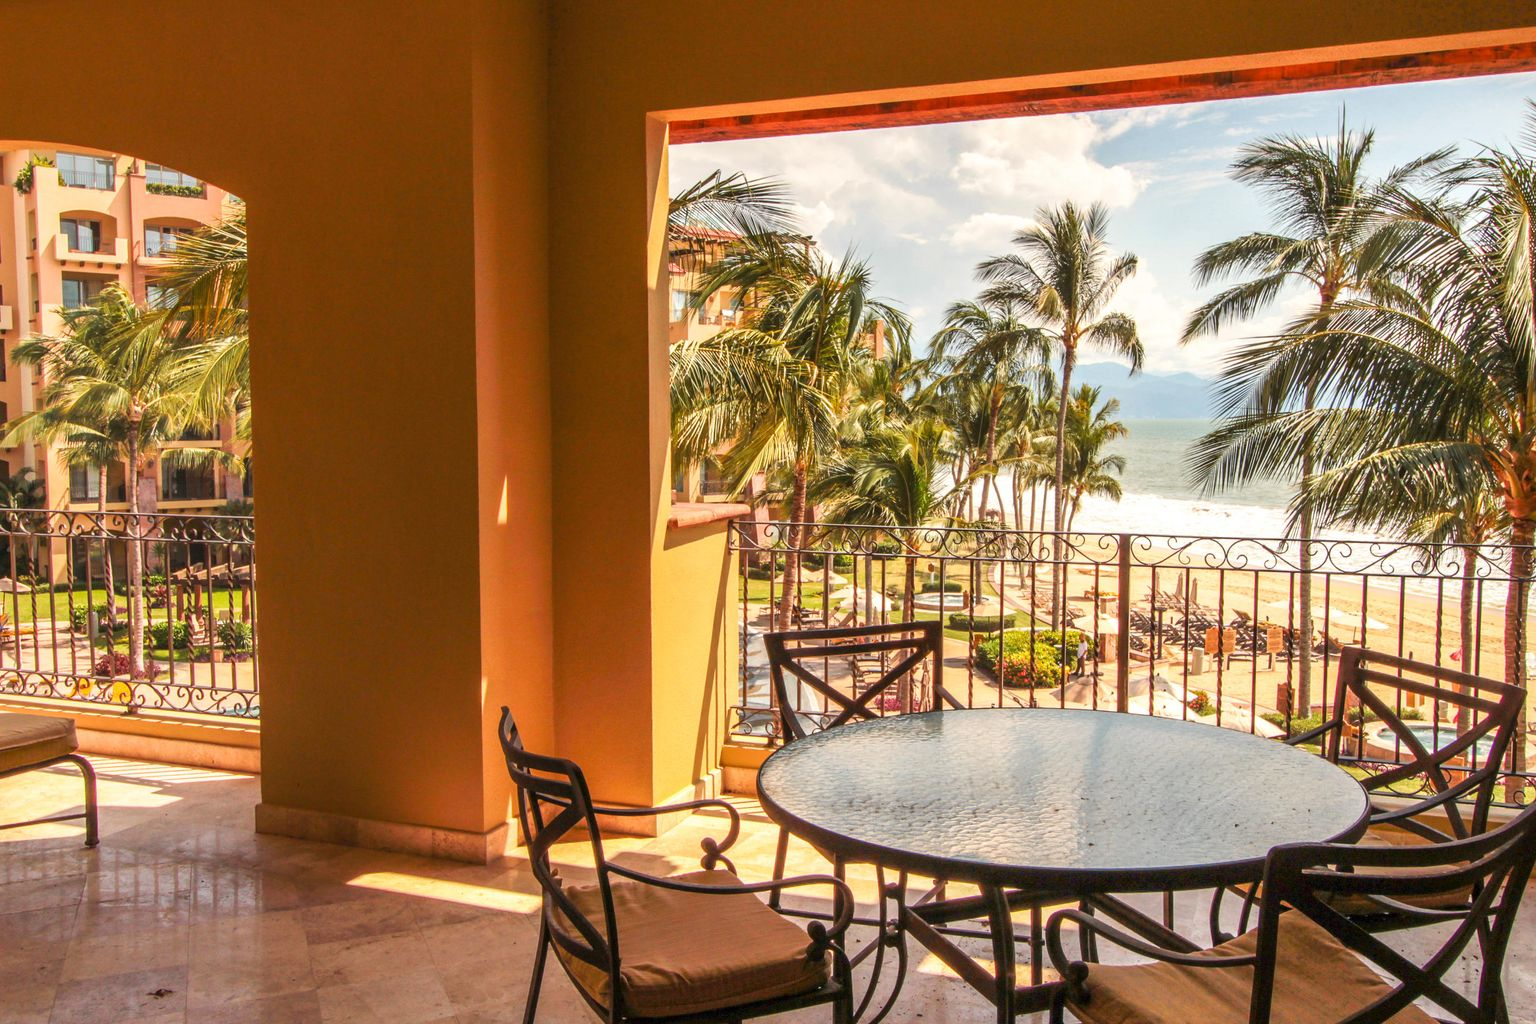 Villa 3302 - Terrace